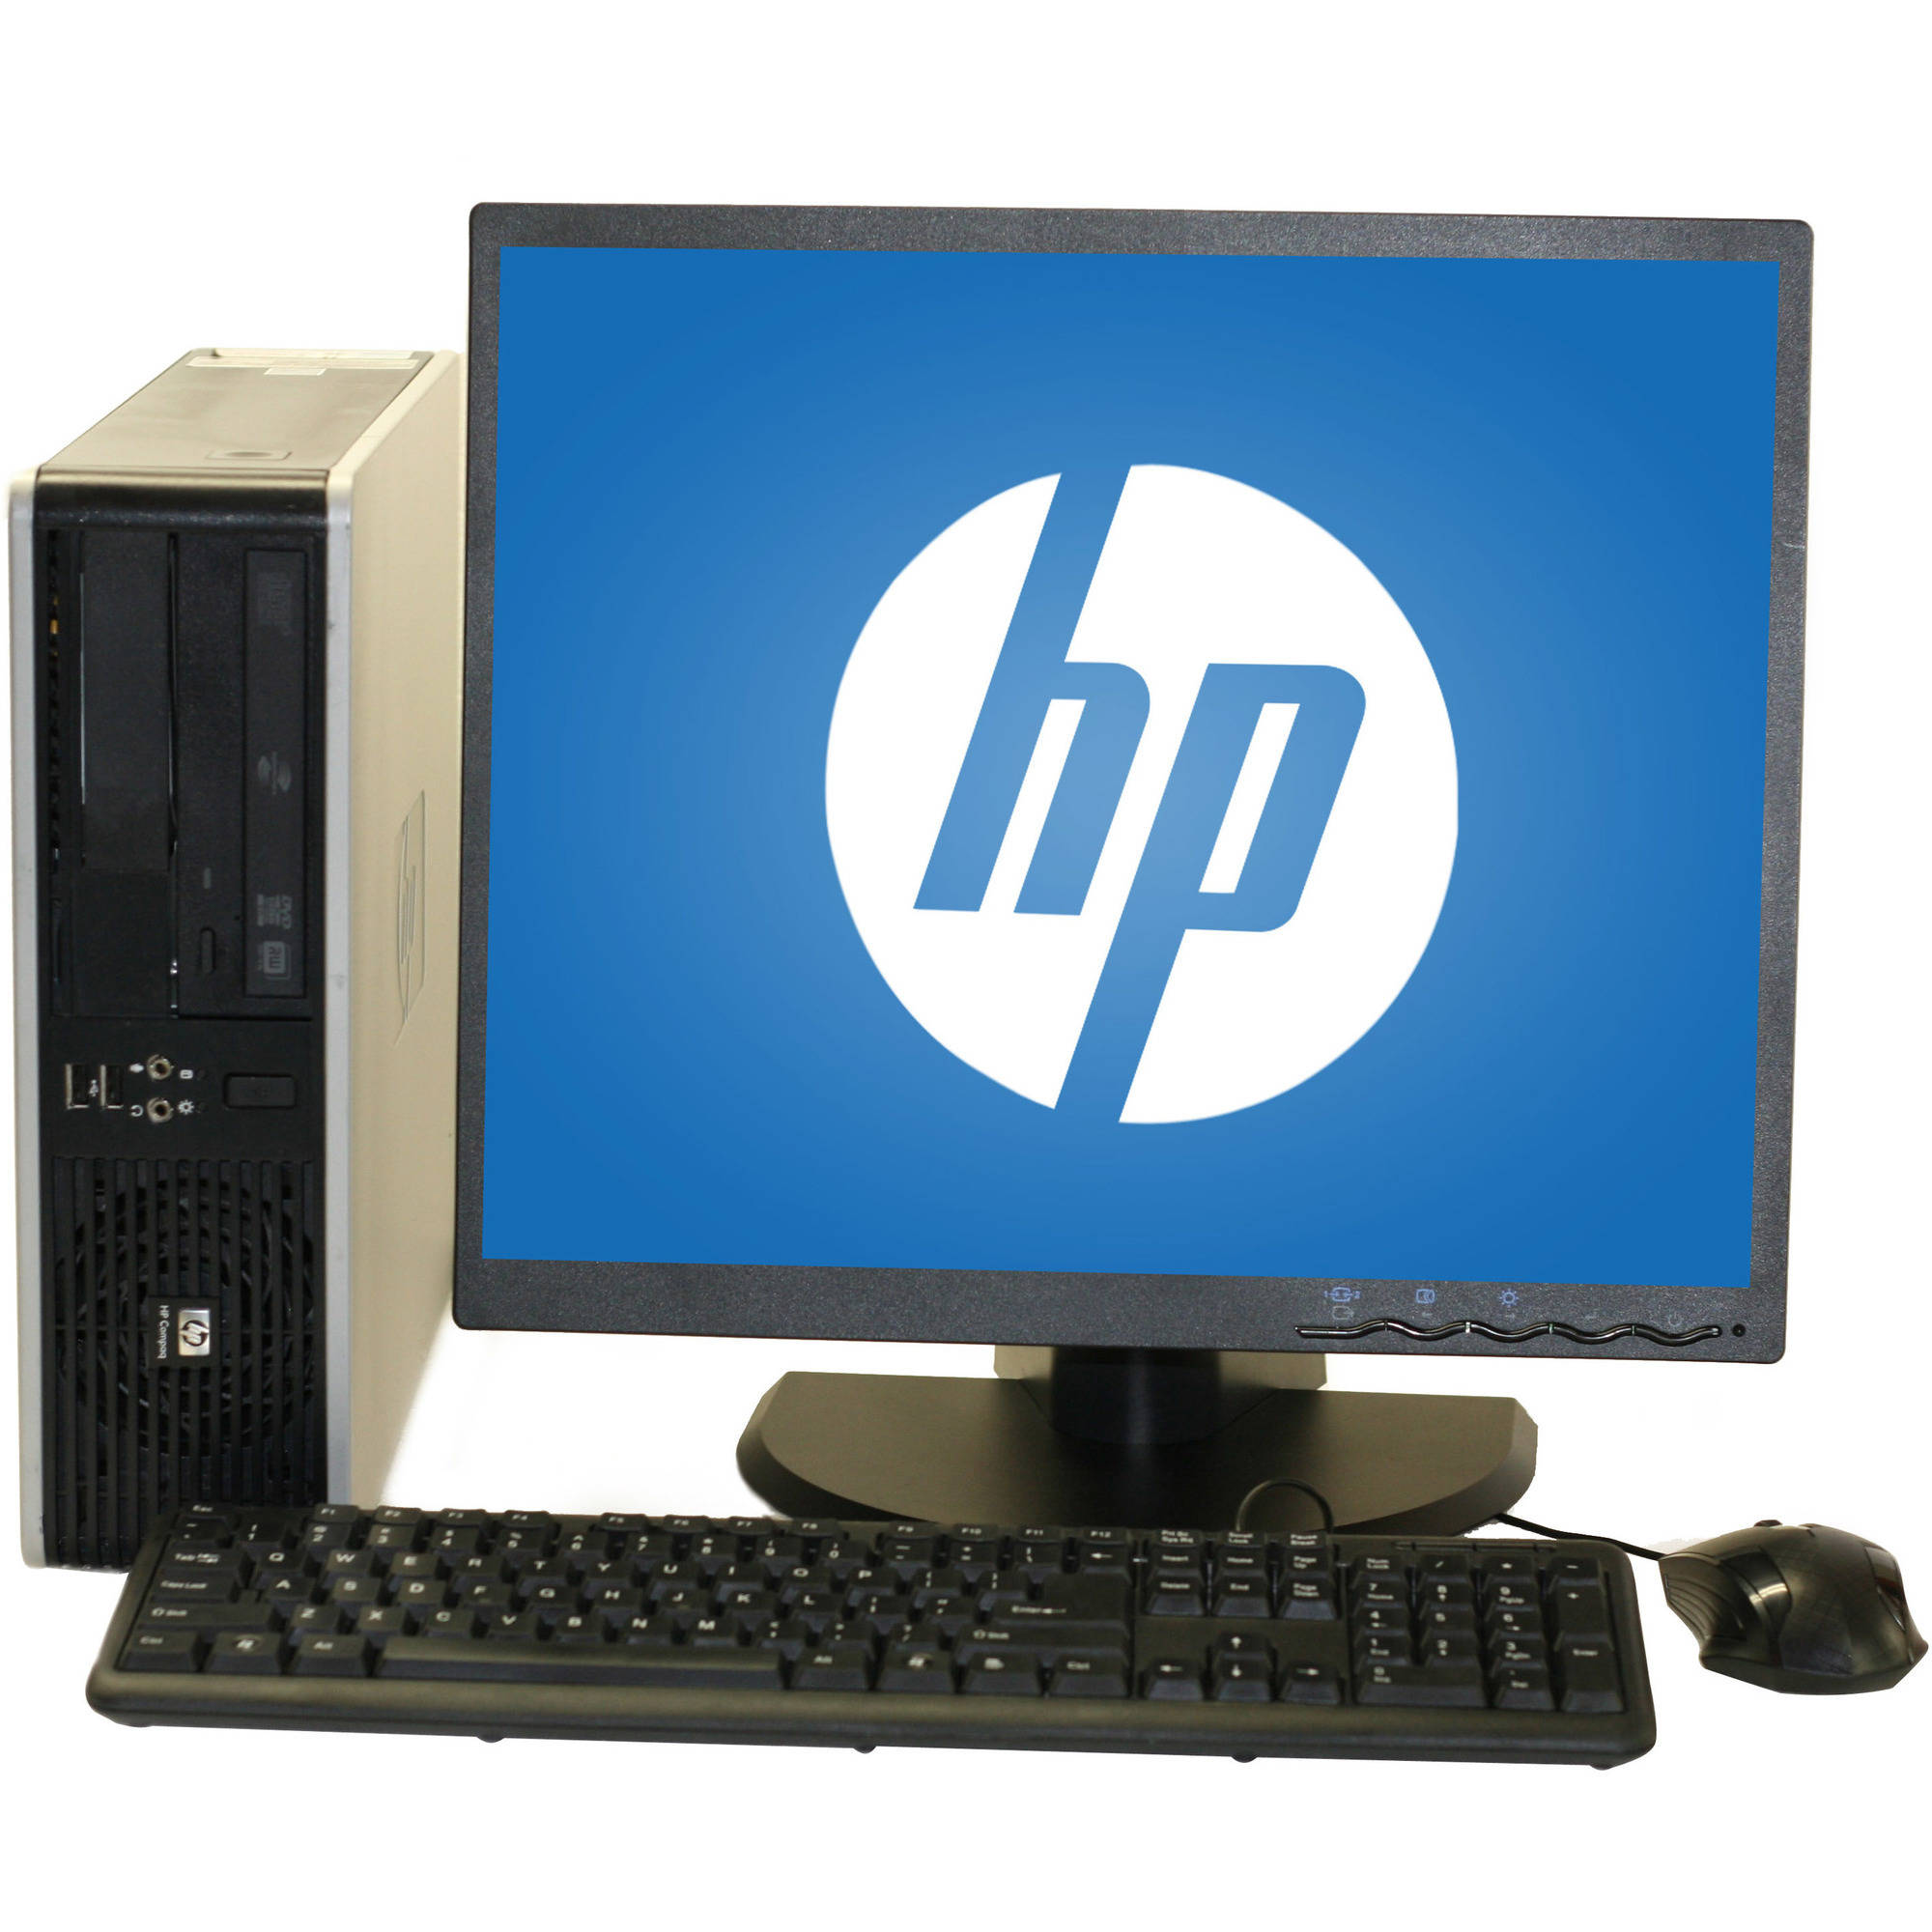 "Refurbished HP 7800 Desktop PC with Intel Core 2 Duo Processor, 4GB Memory, 19"" Monitor, 250GB Hard Drive and Windows 10 Home"